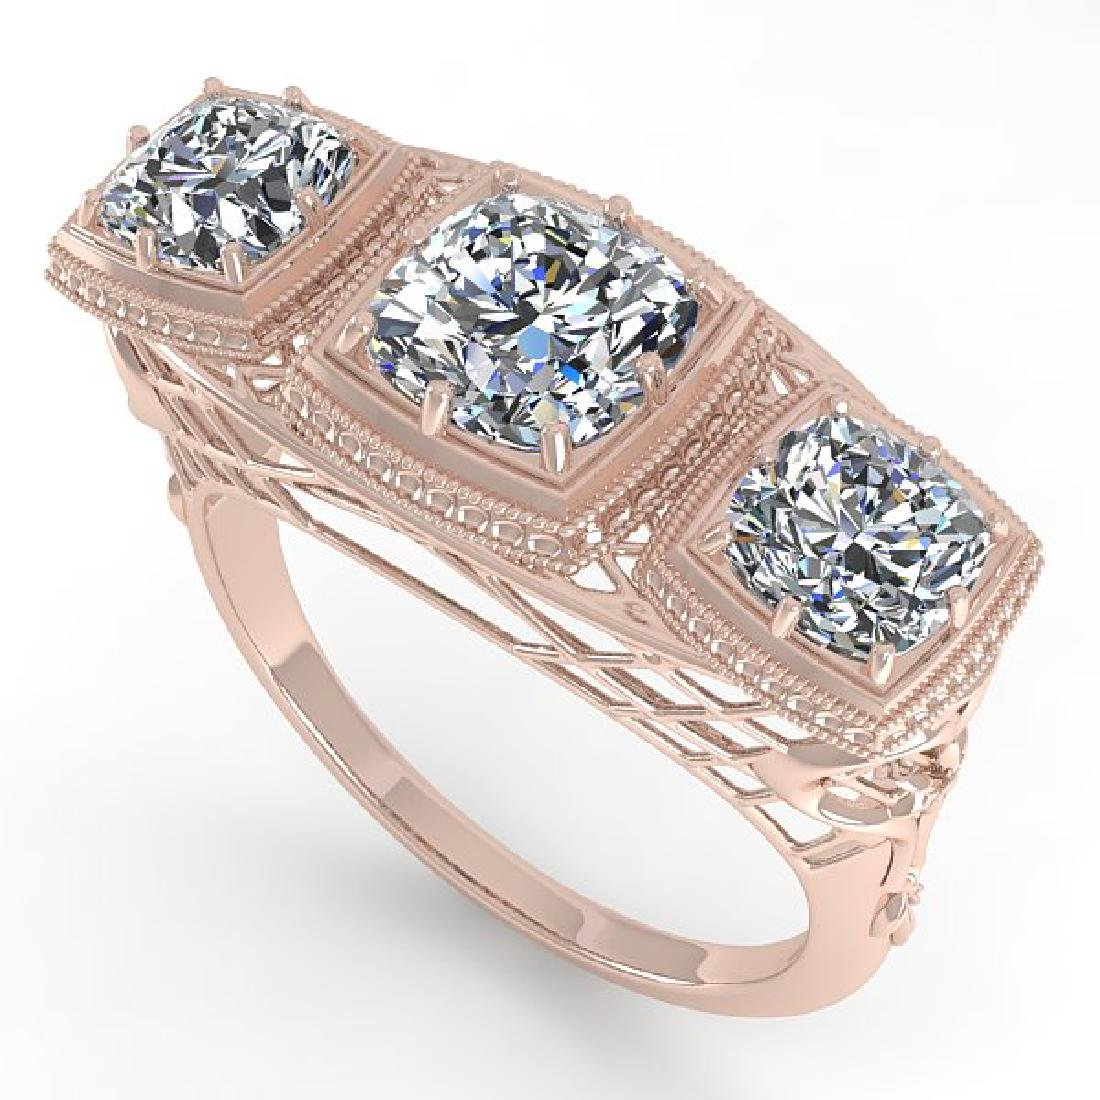 2 CTW VS/SI Cushion Cut Diamond Ring Art Deco 14K Rose - 2